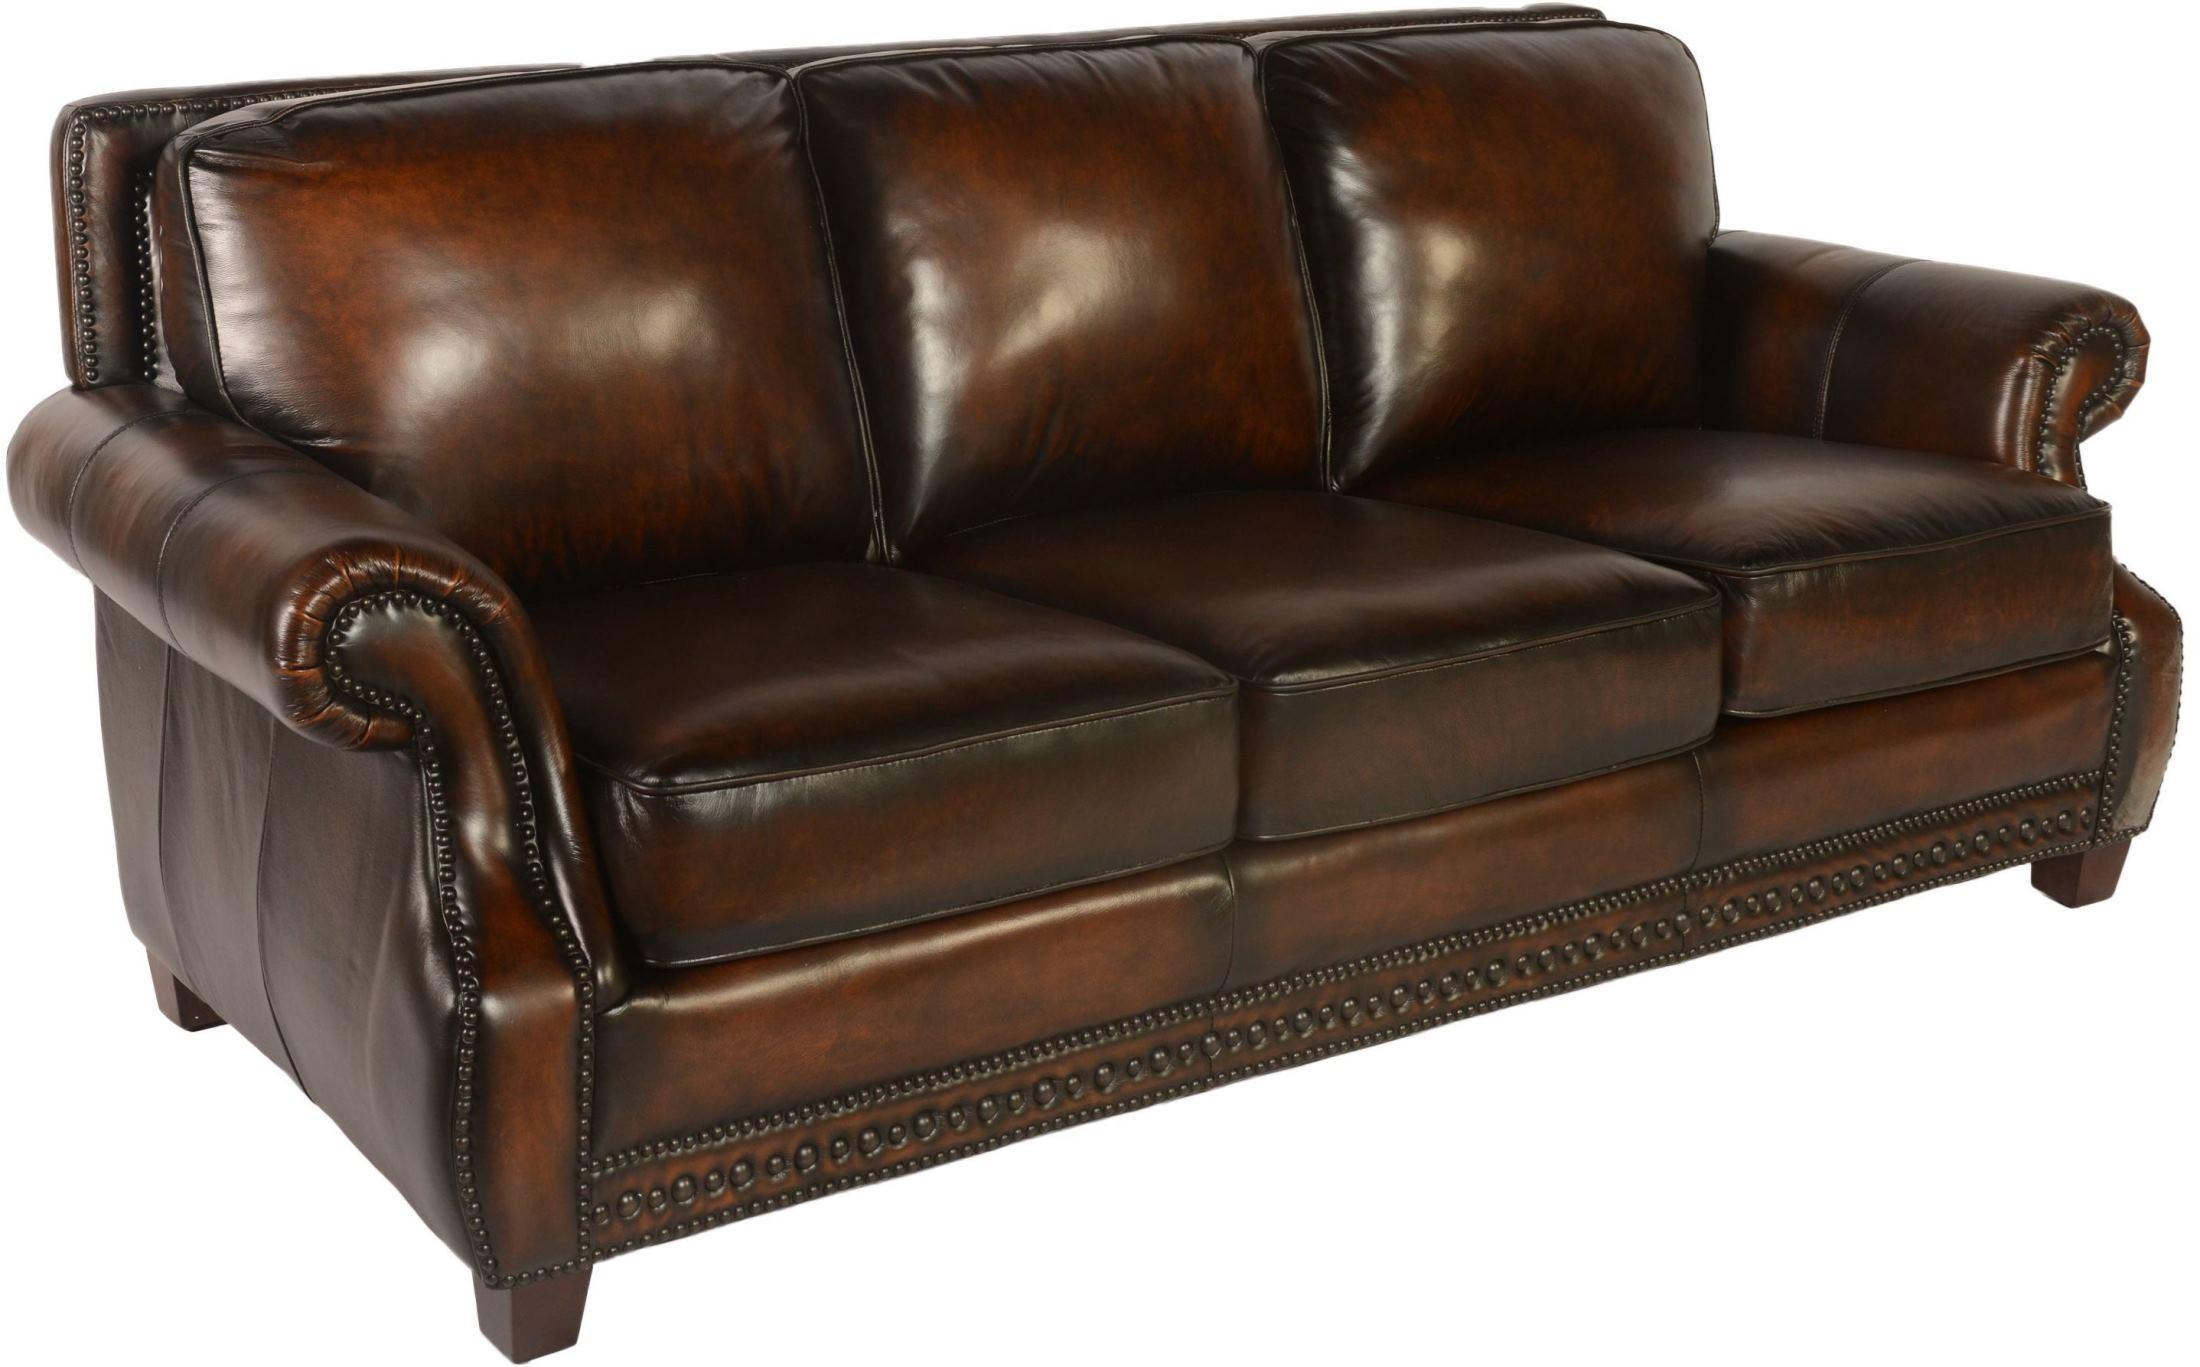 Prato Cocoa Brompton Leather Sofa From Lazzaro | Coleman Furniture Pertaining To Brompton Leather Sofas (View 8 of 20)